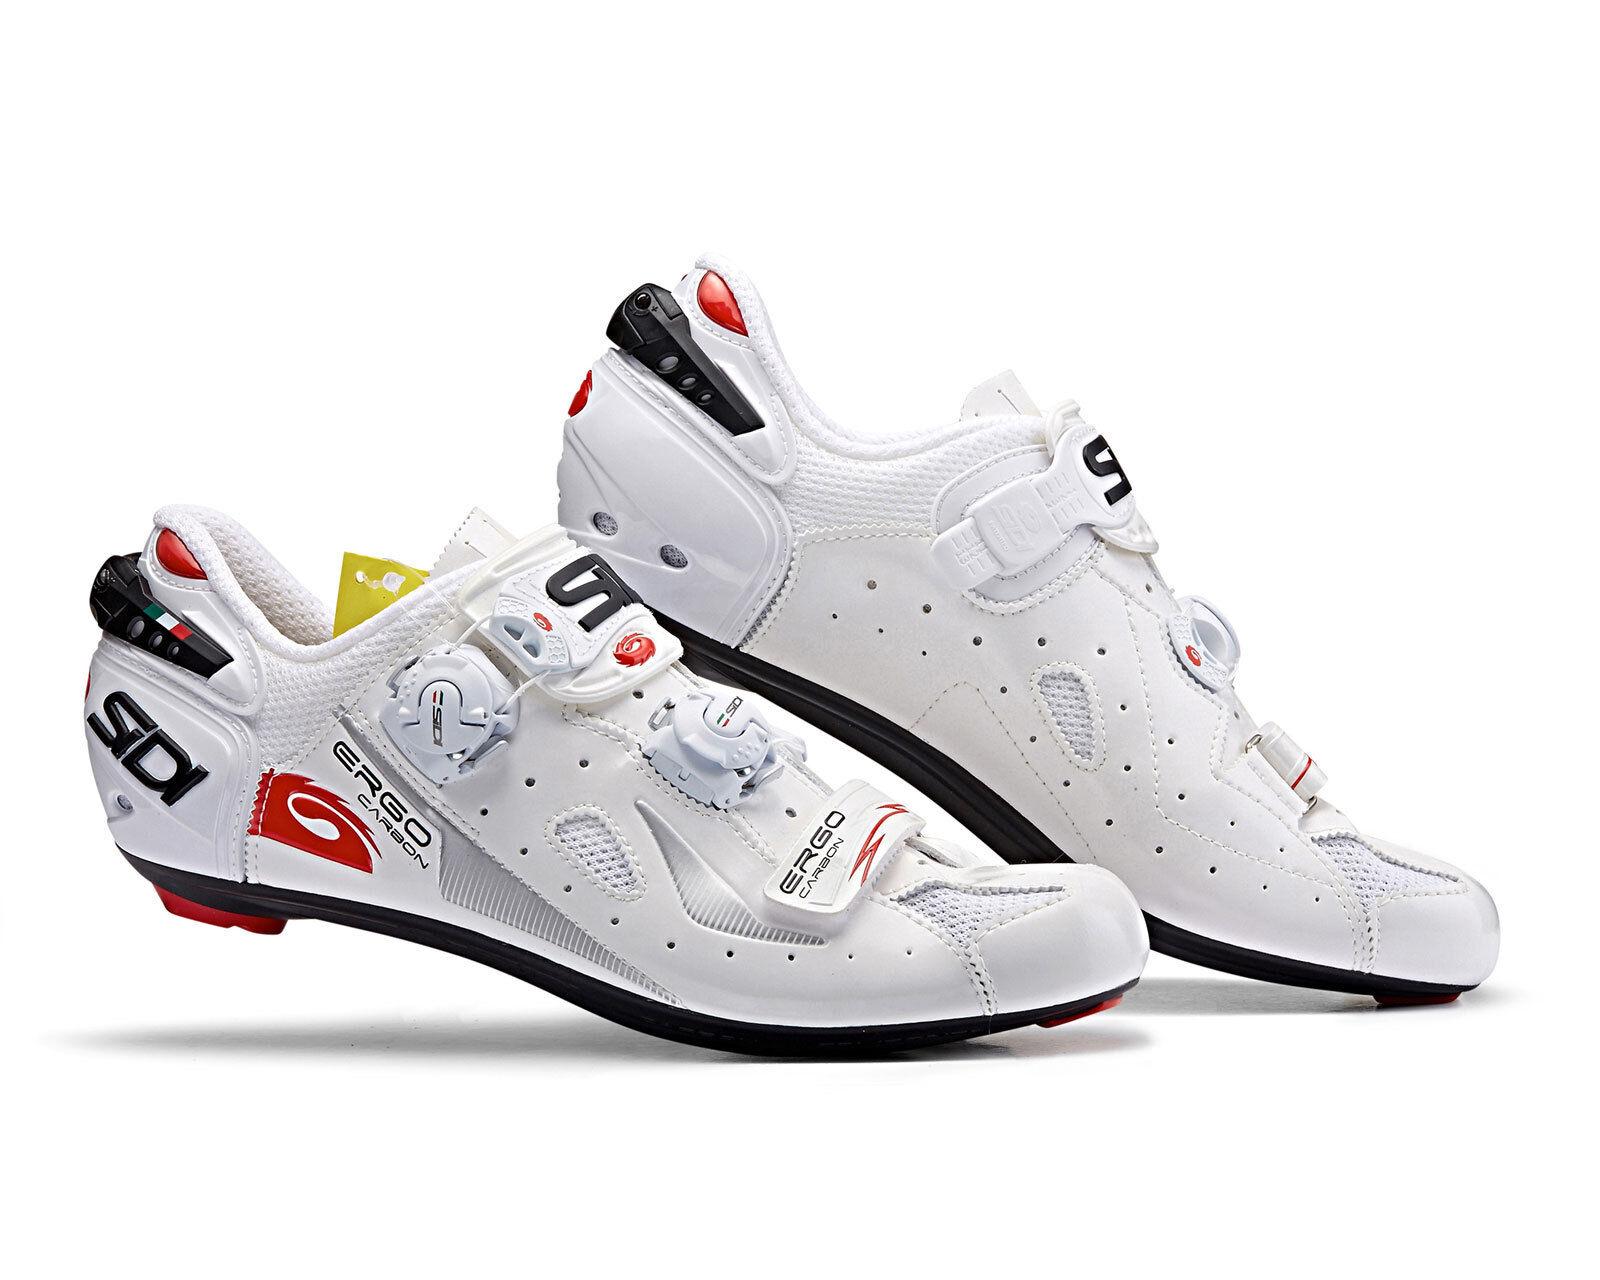 SIDI Ergo 4 Carbon Composite Road Cycling shoes - White White